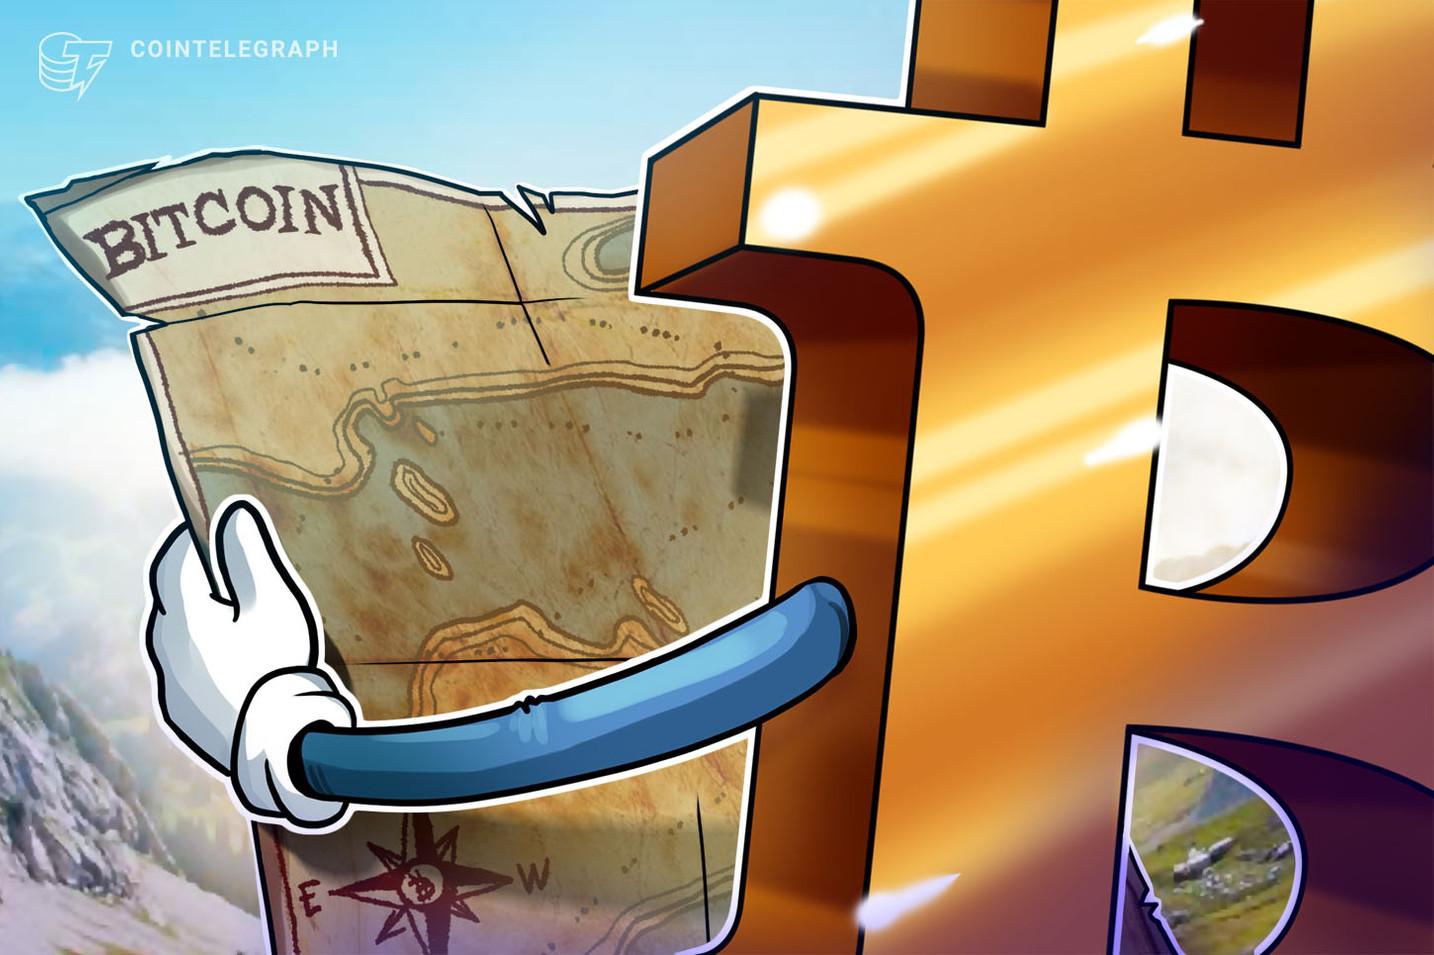 Preço do Bitcoin consolida-se abaixo de US$ 10.000 depois do halving - o que esperar?